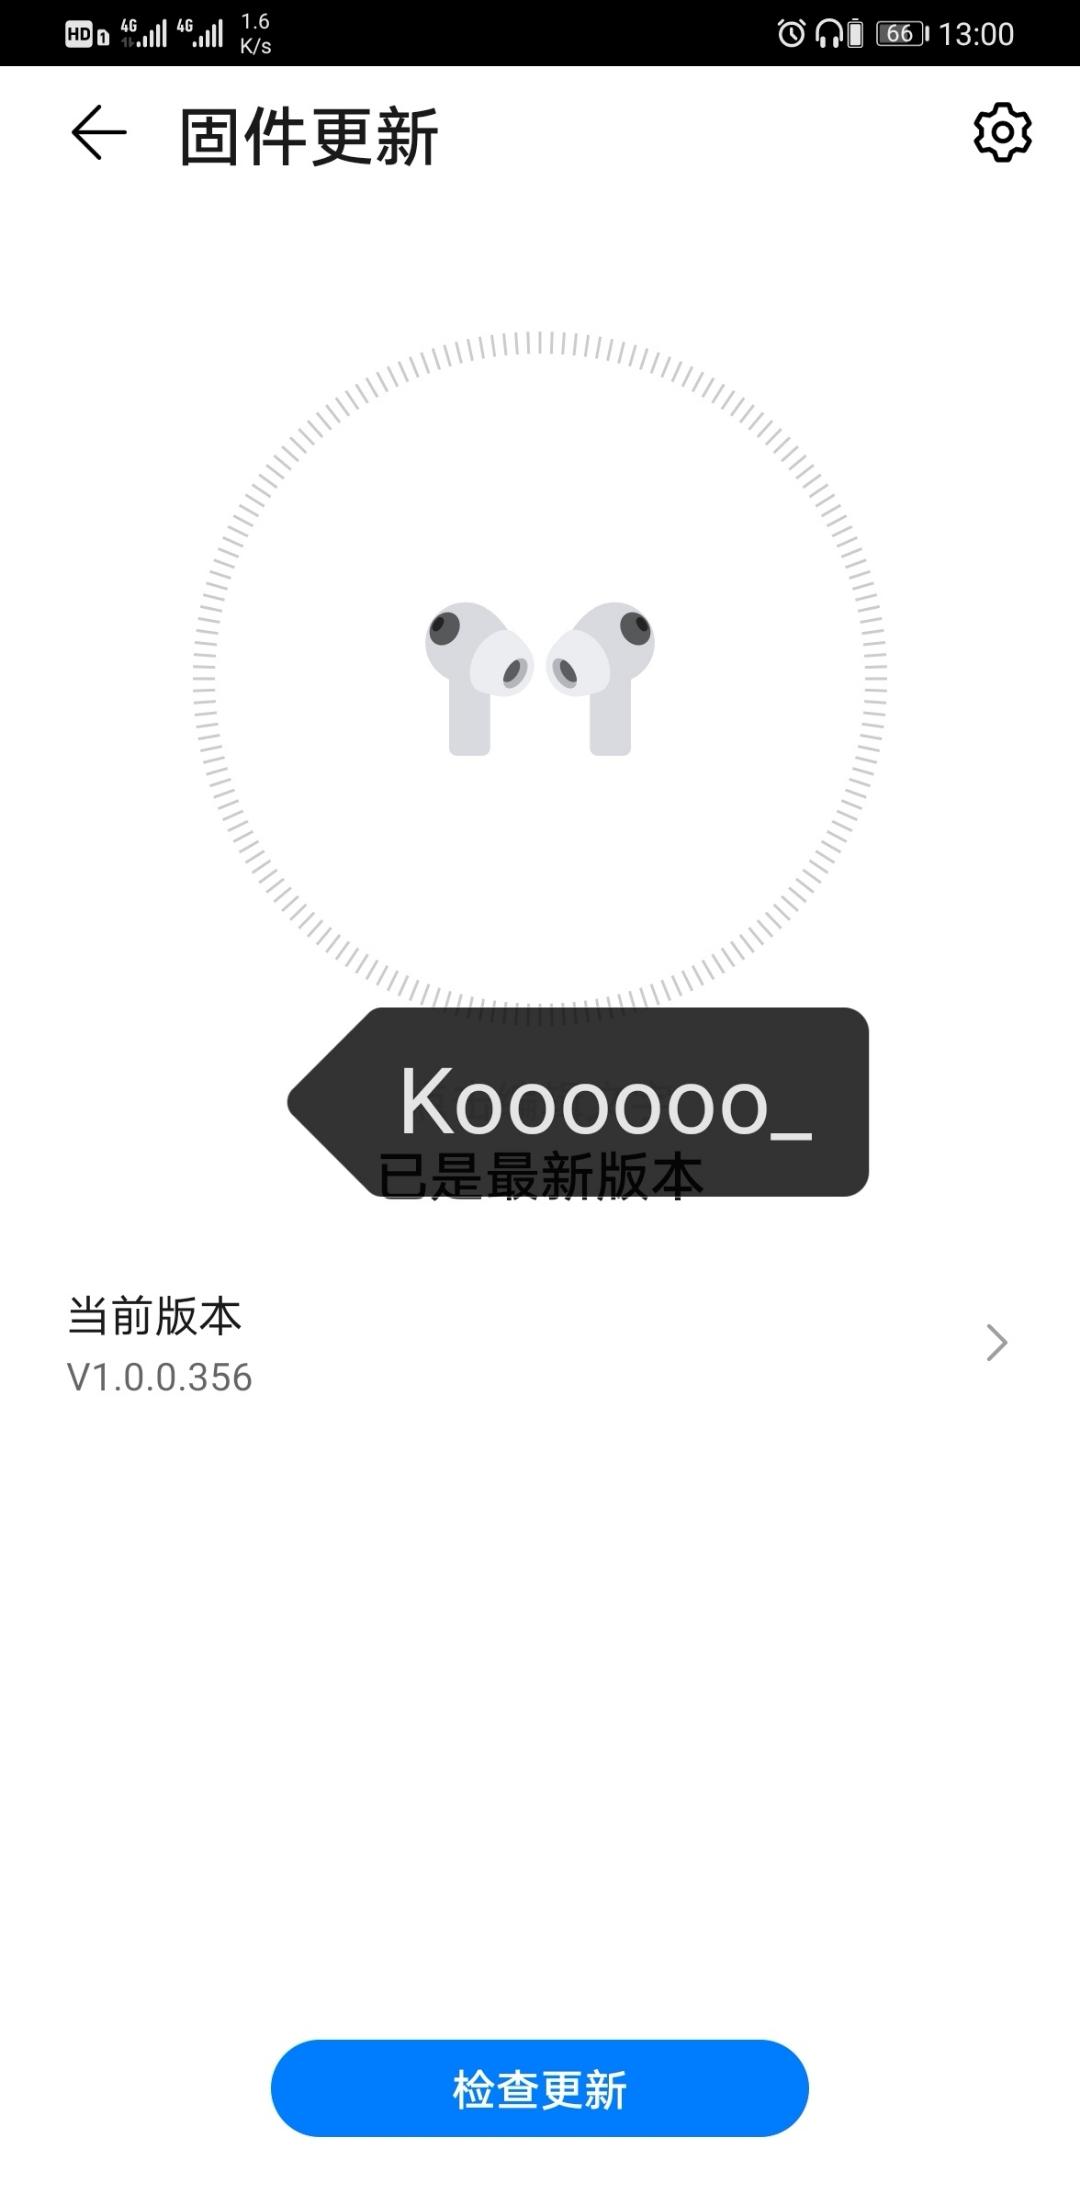 Screenshot_20210329_130038_com.huawei.smarthome_edit_420907535546711.jpg